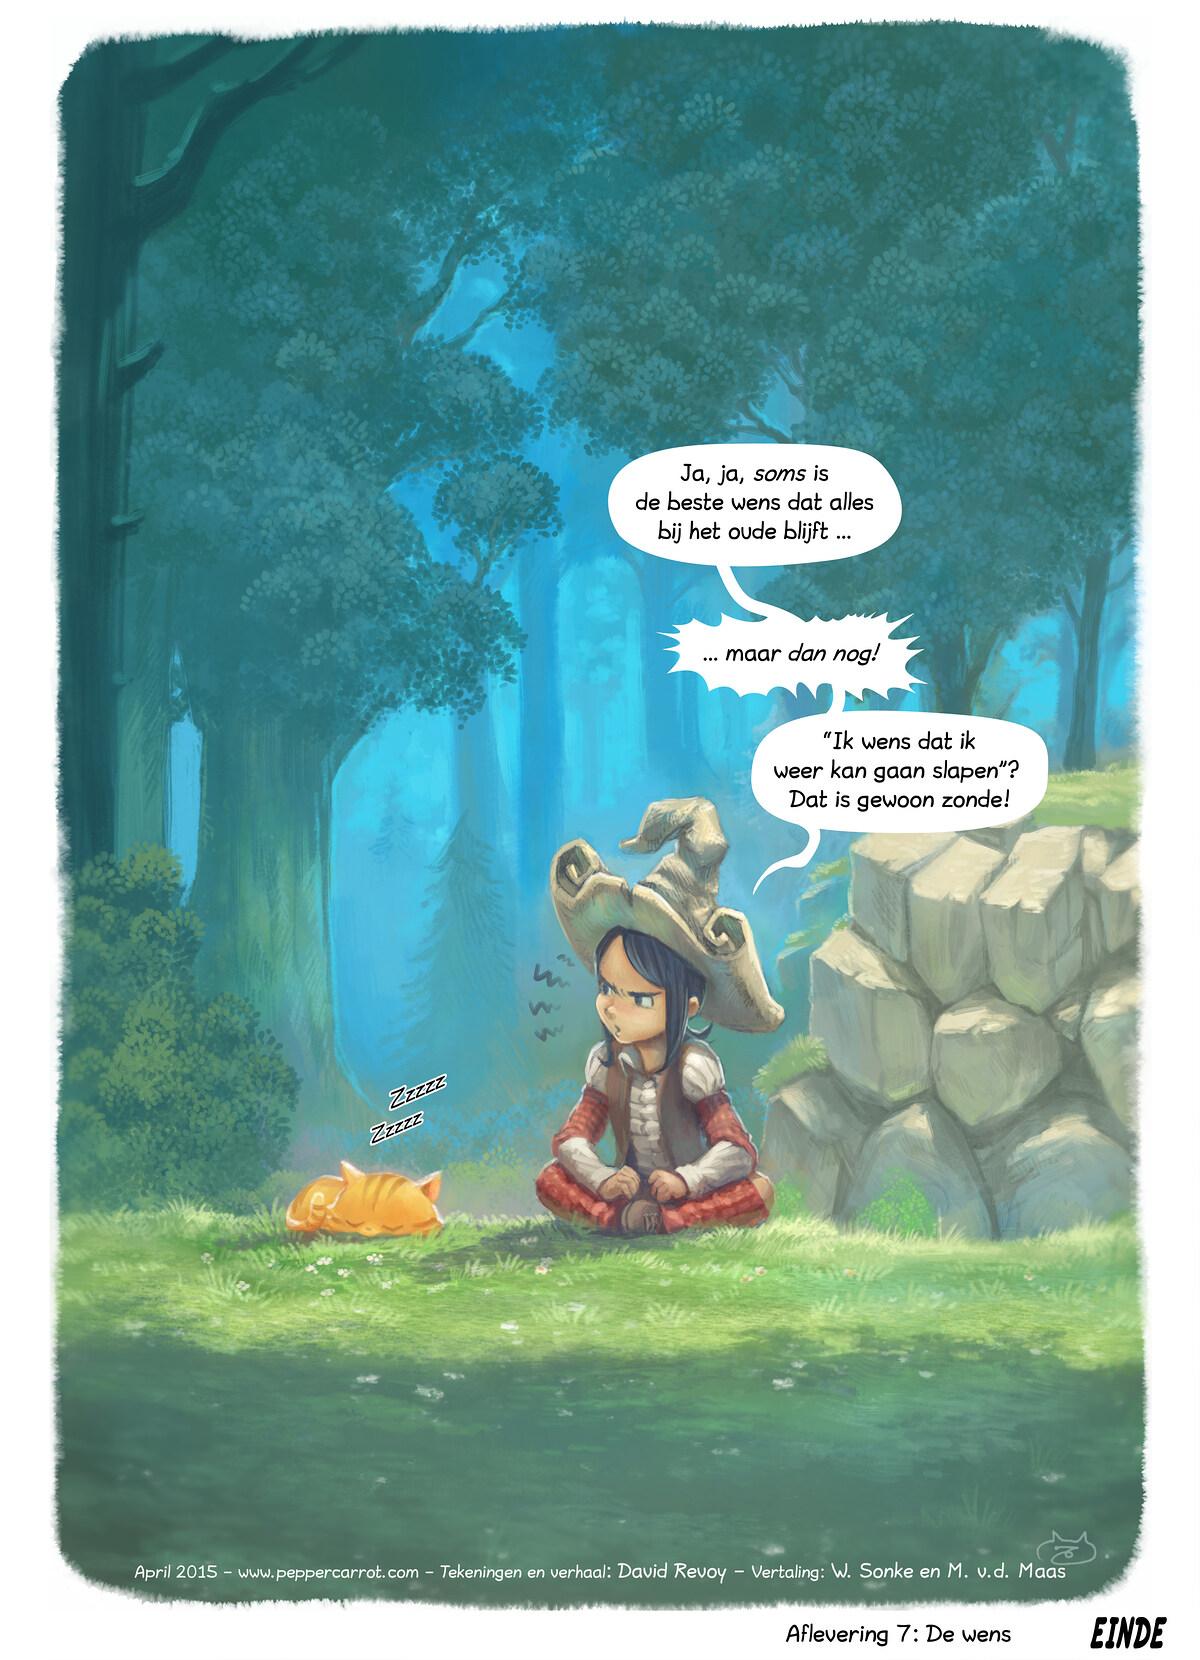 Aflevering 7: De wens, Page 5